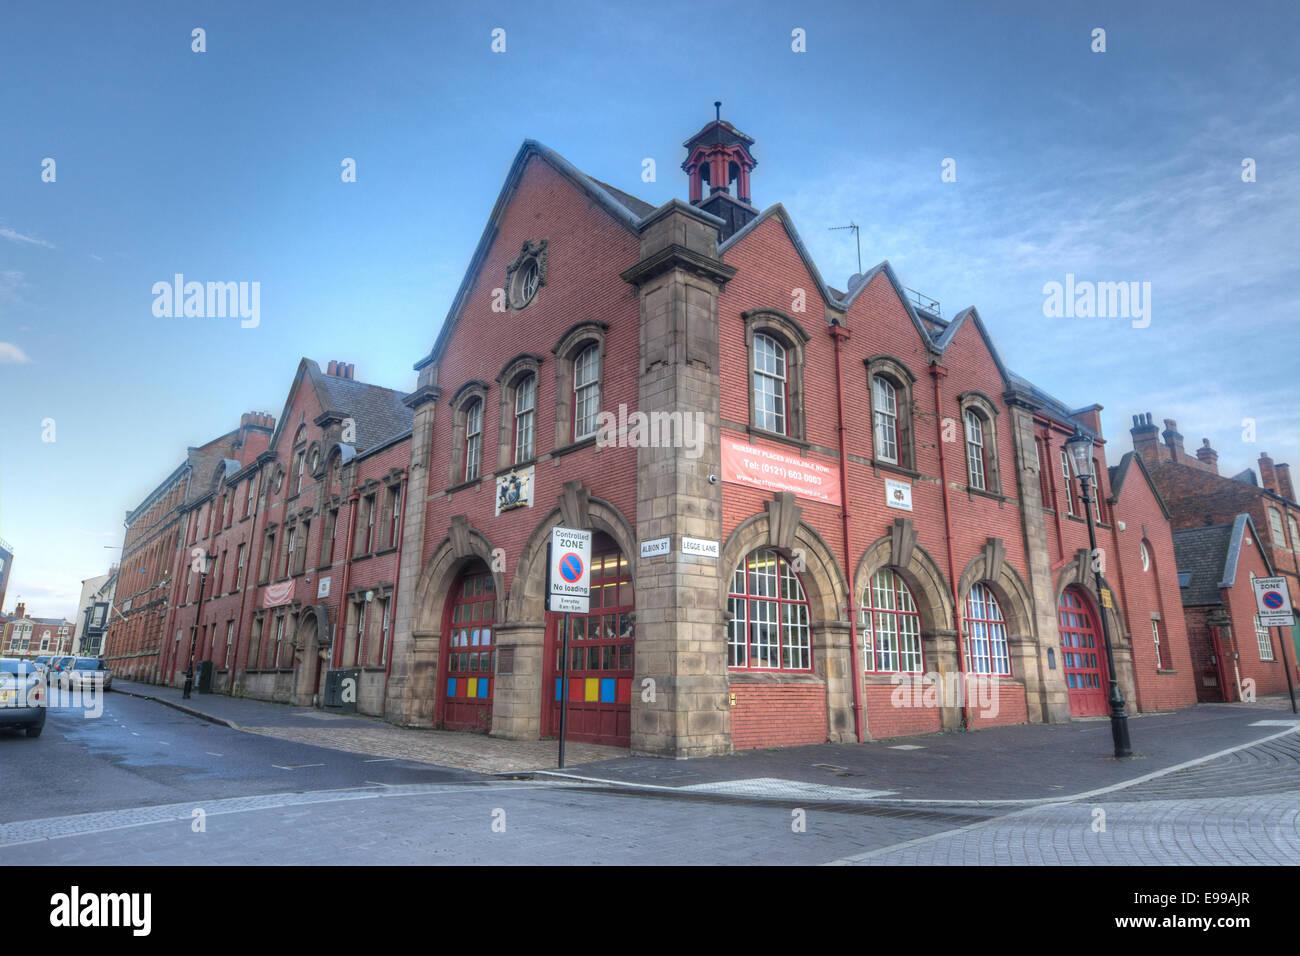 Old Fire Station. Birmingham - Stock Image